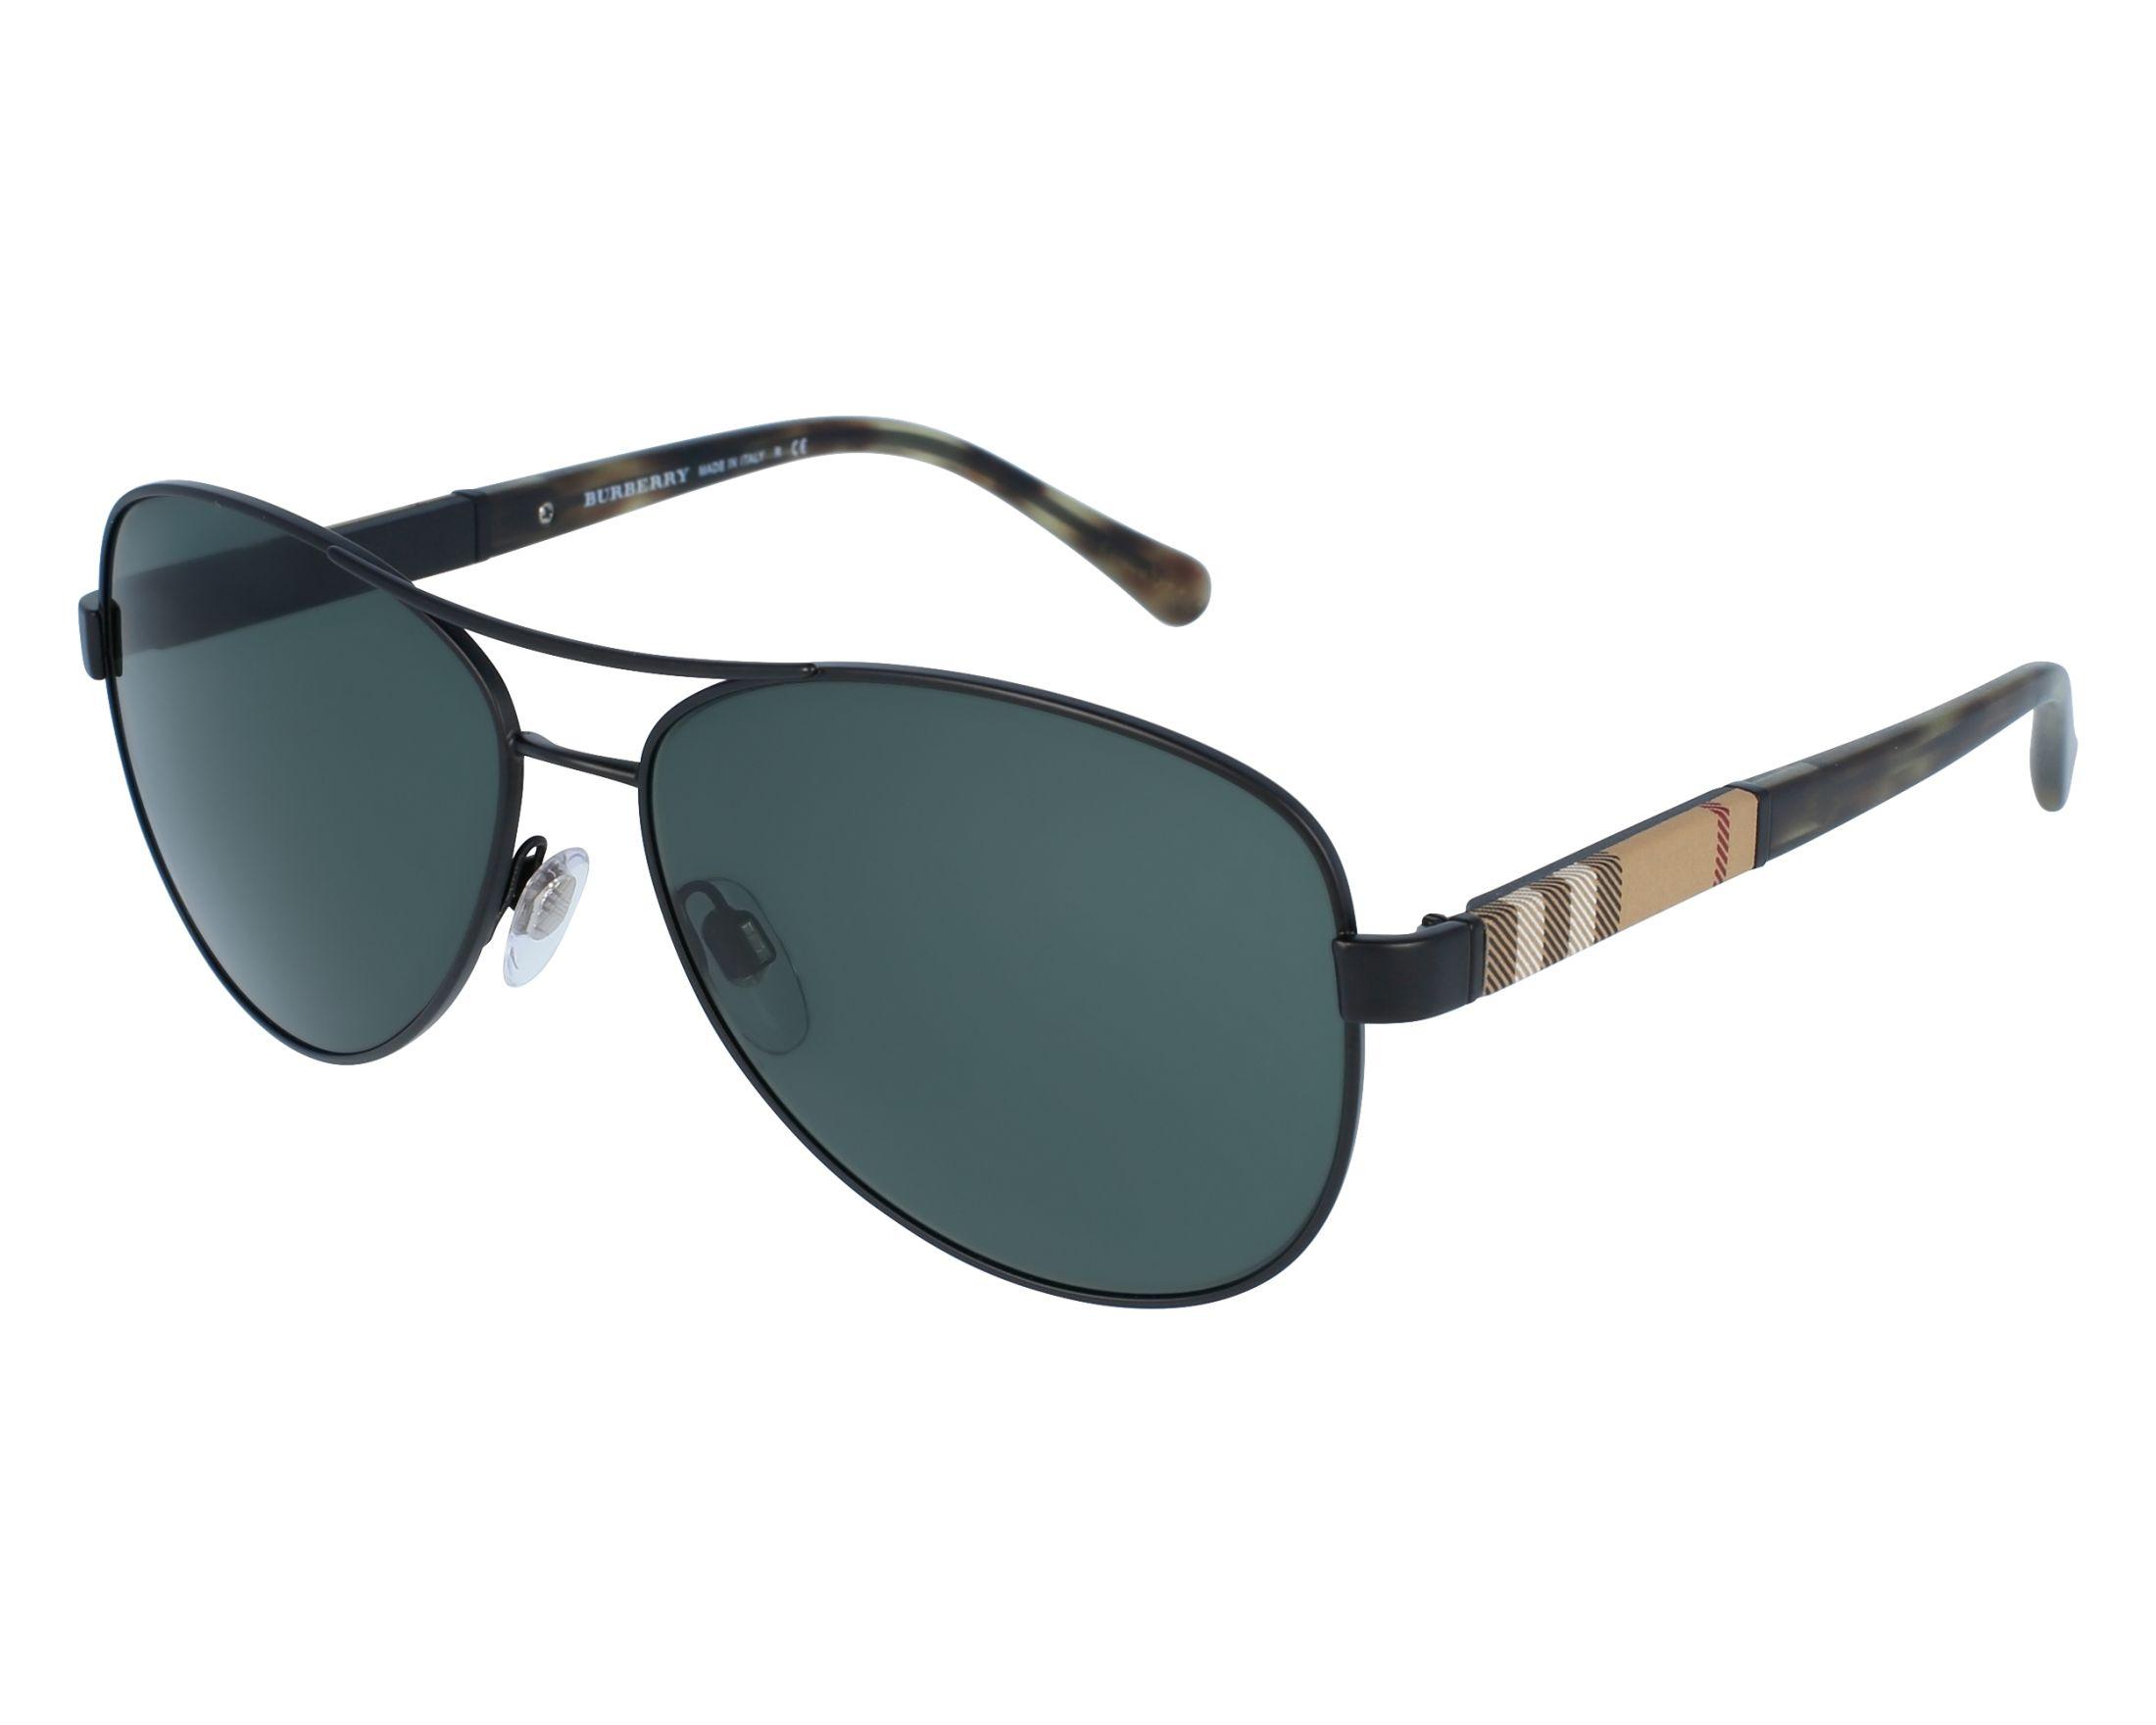 6da6a81e300 Sunglasses Burberry BE-3080 123371 59-14 Black Beige front view